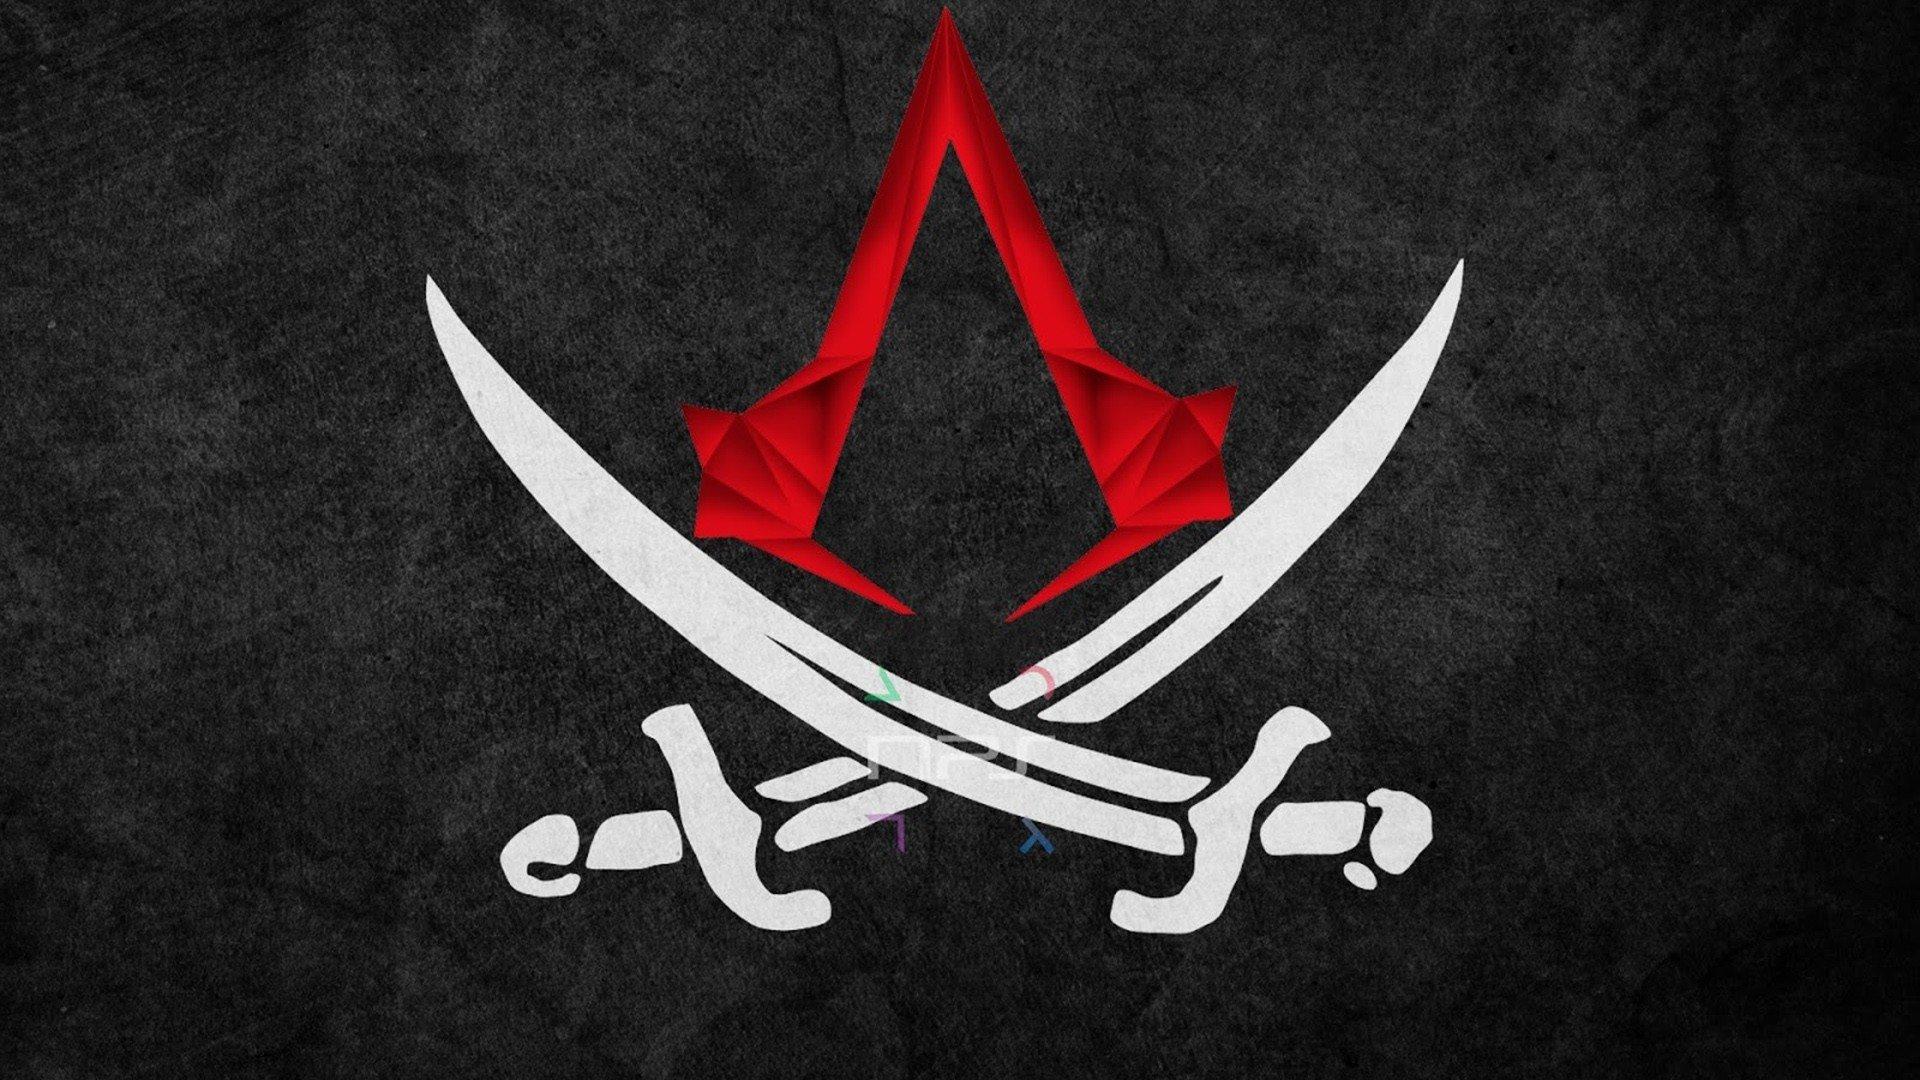 Assassin S Creed Iv Black Flag Hd Wallpaper Background Image